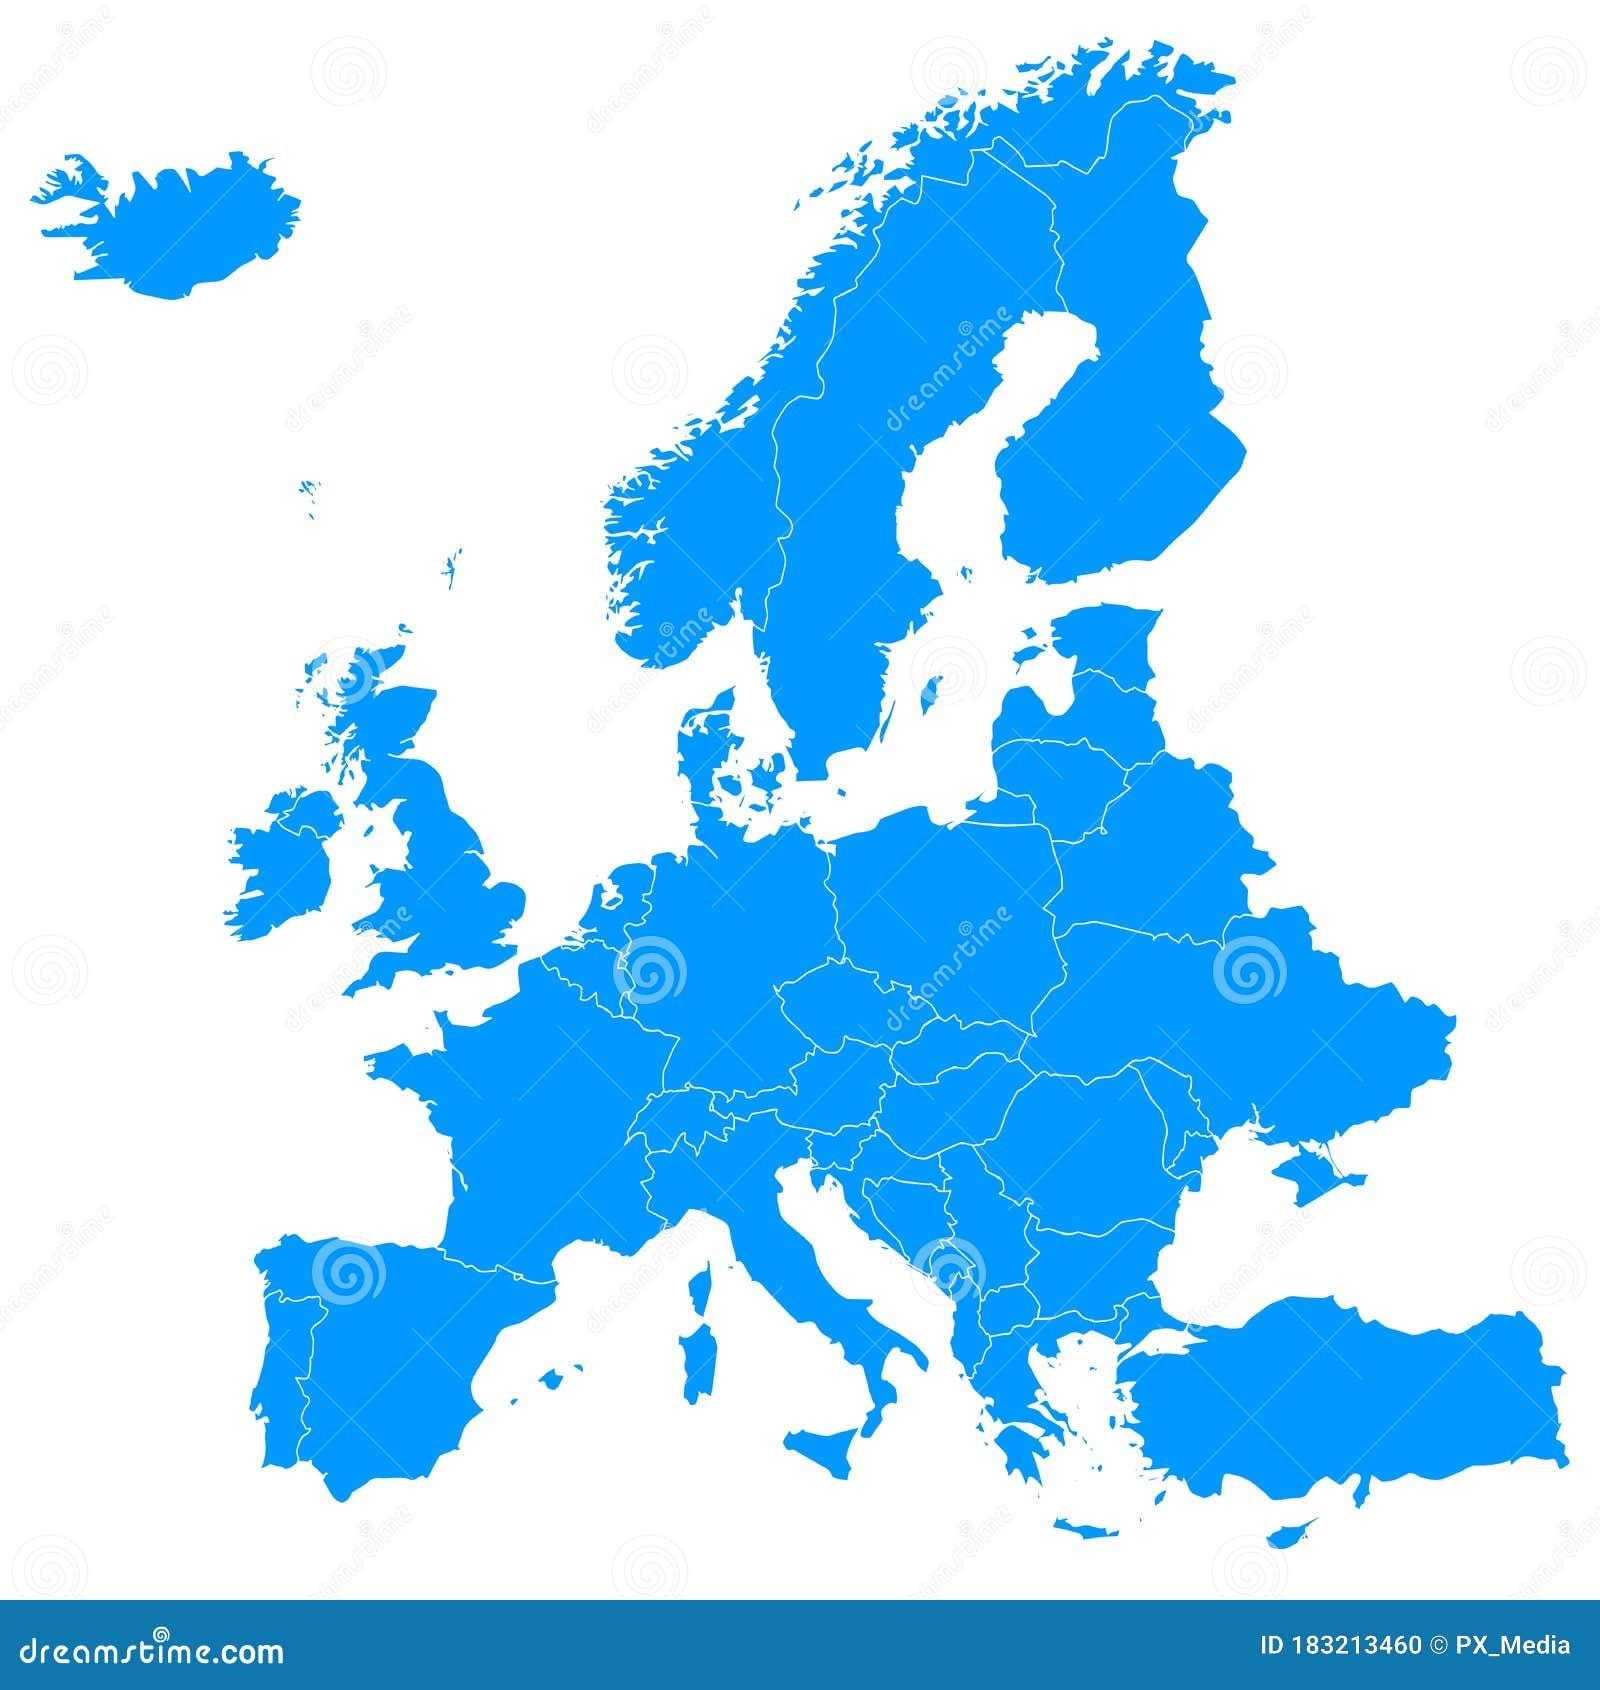 Image of: Blue Map Of Europe Political Borders Stock Illustration Illustration Of Portugal European 183213460